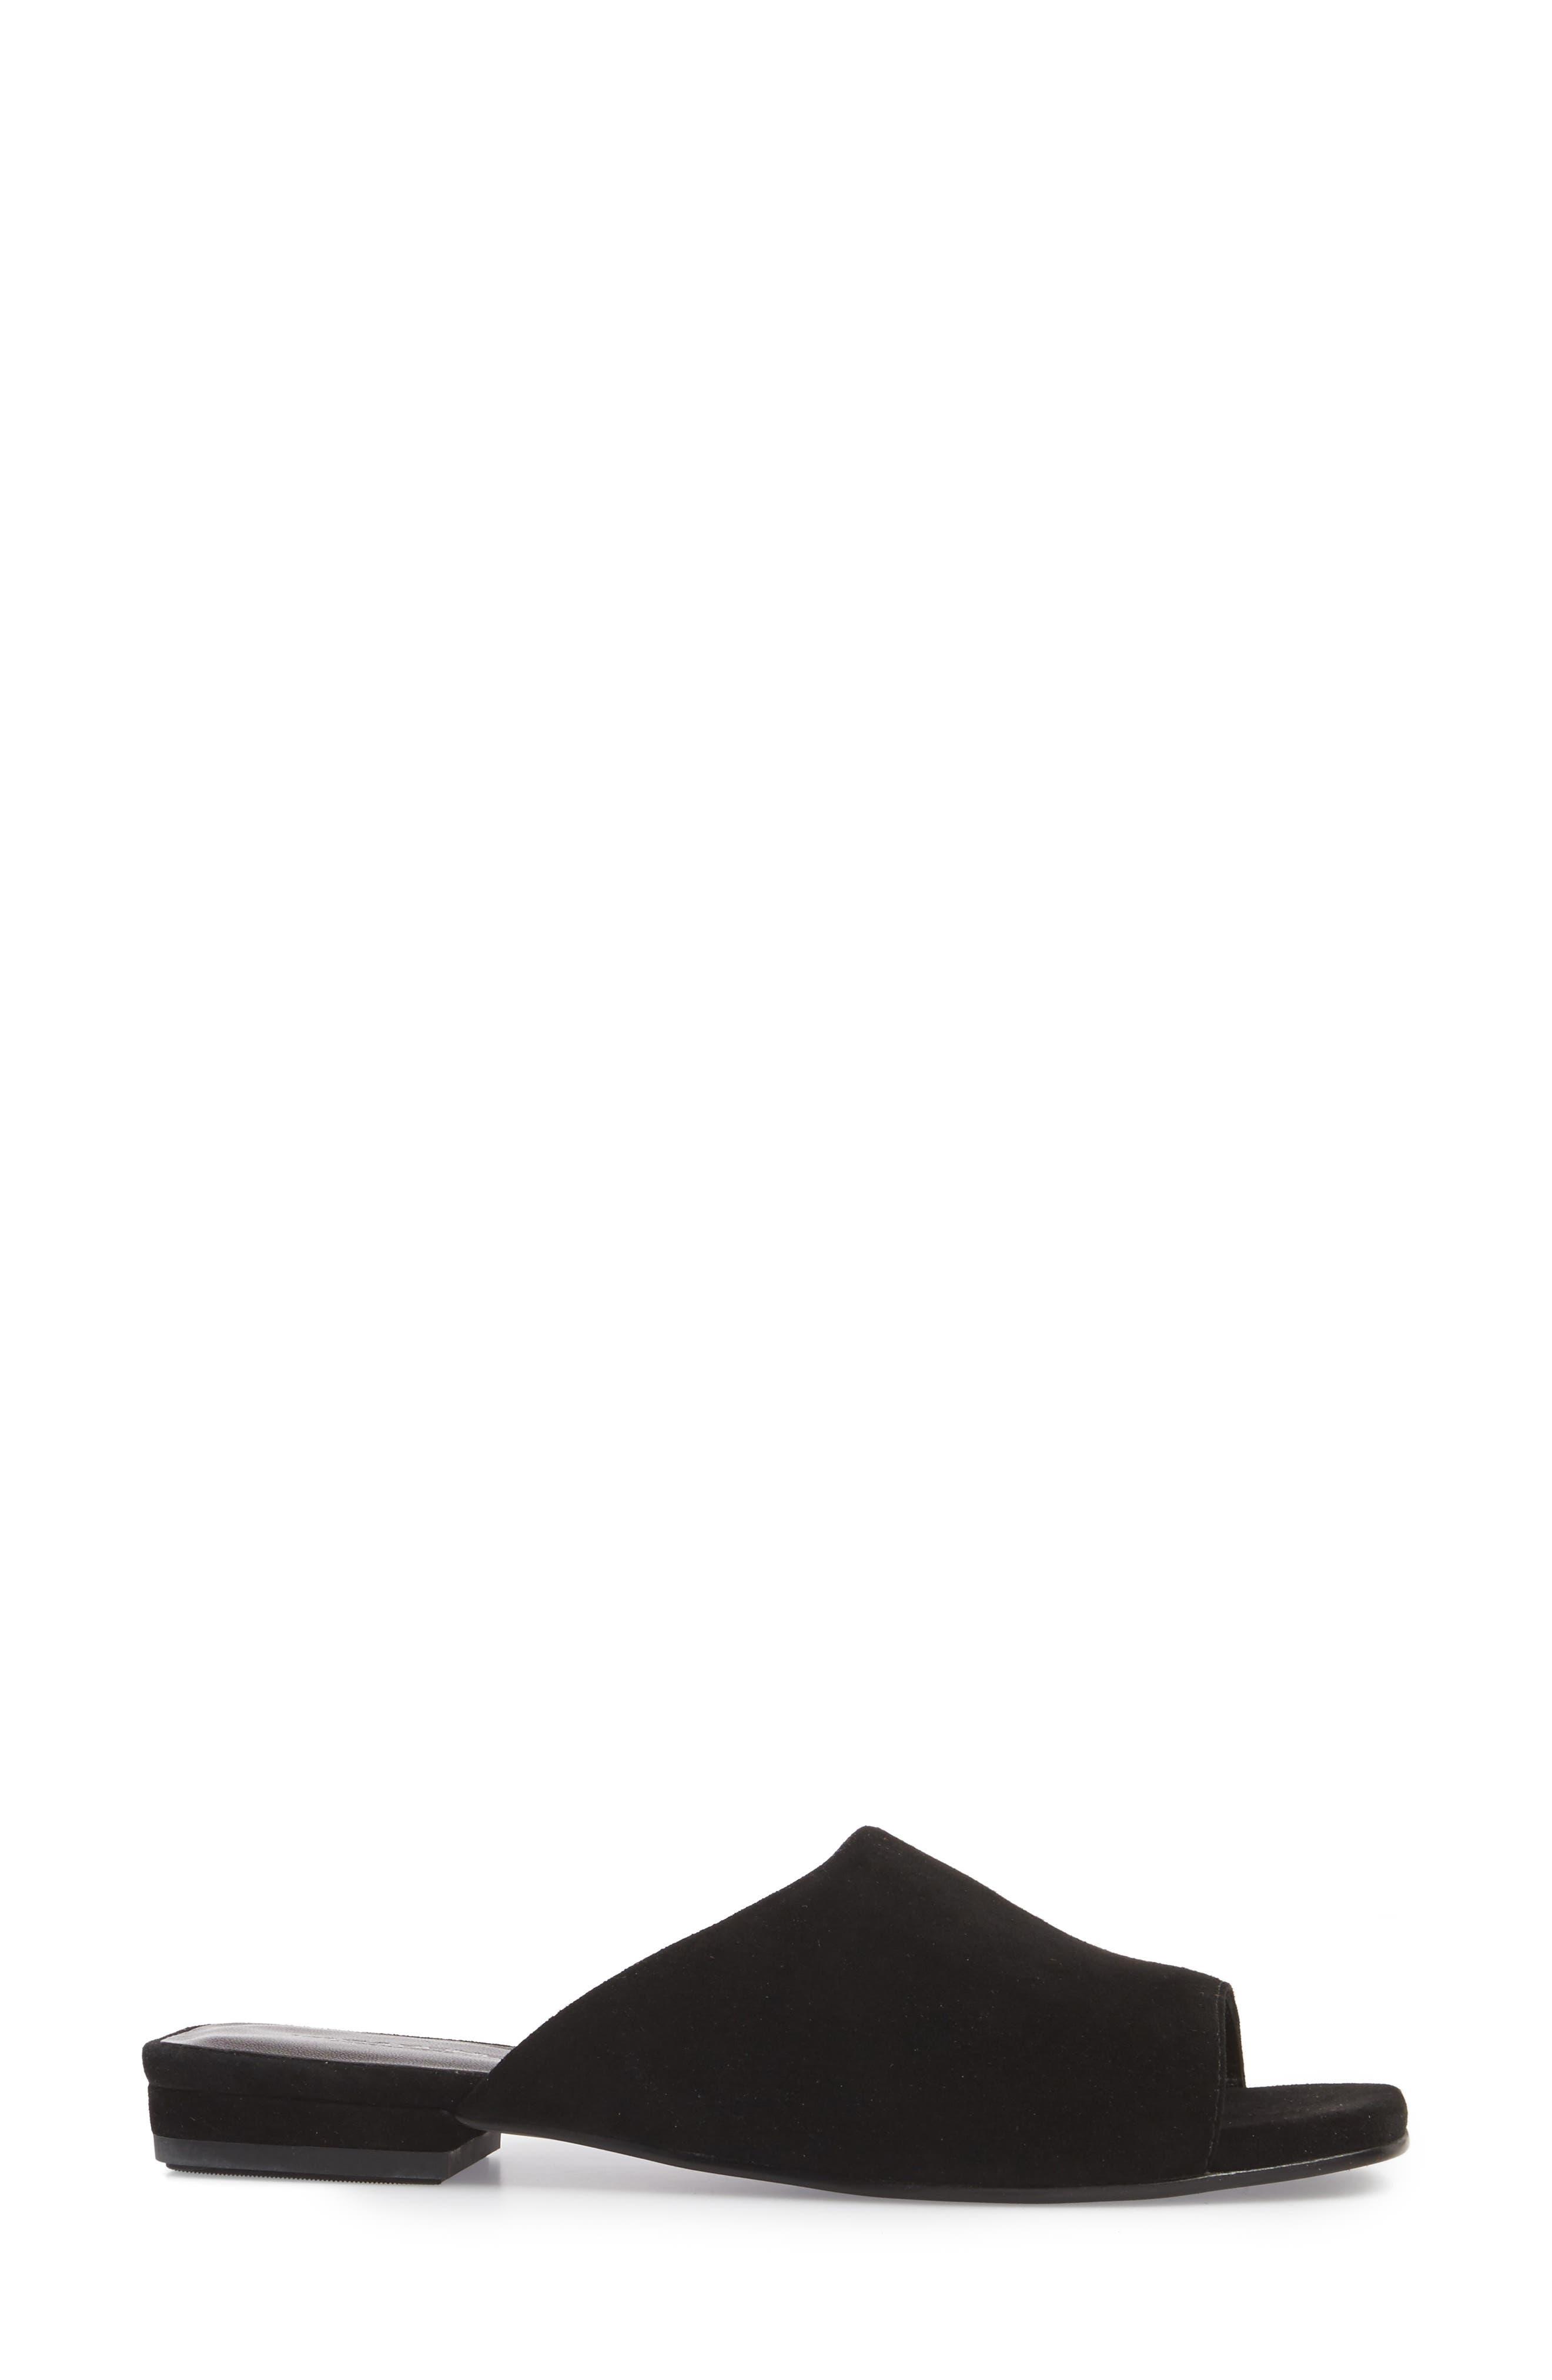 VAGABOND,                             Shoemakers Becky Slide Sandal,                             Alternate thumbnail 3, color,                             002